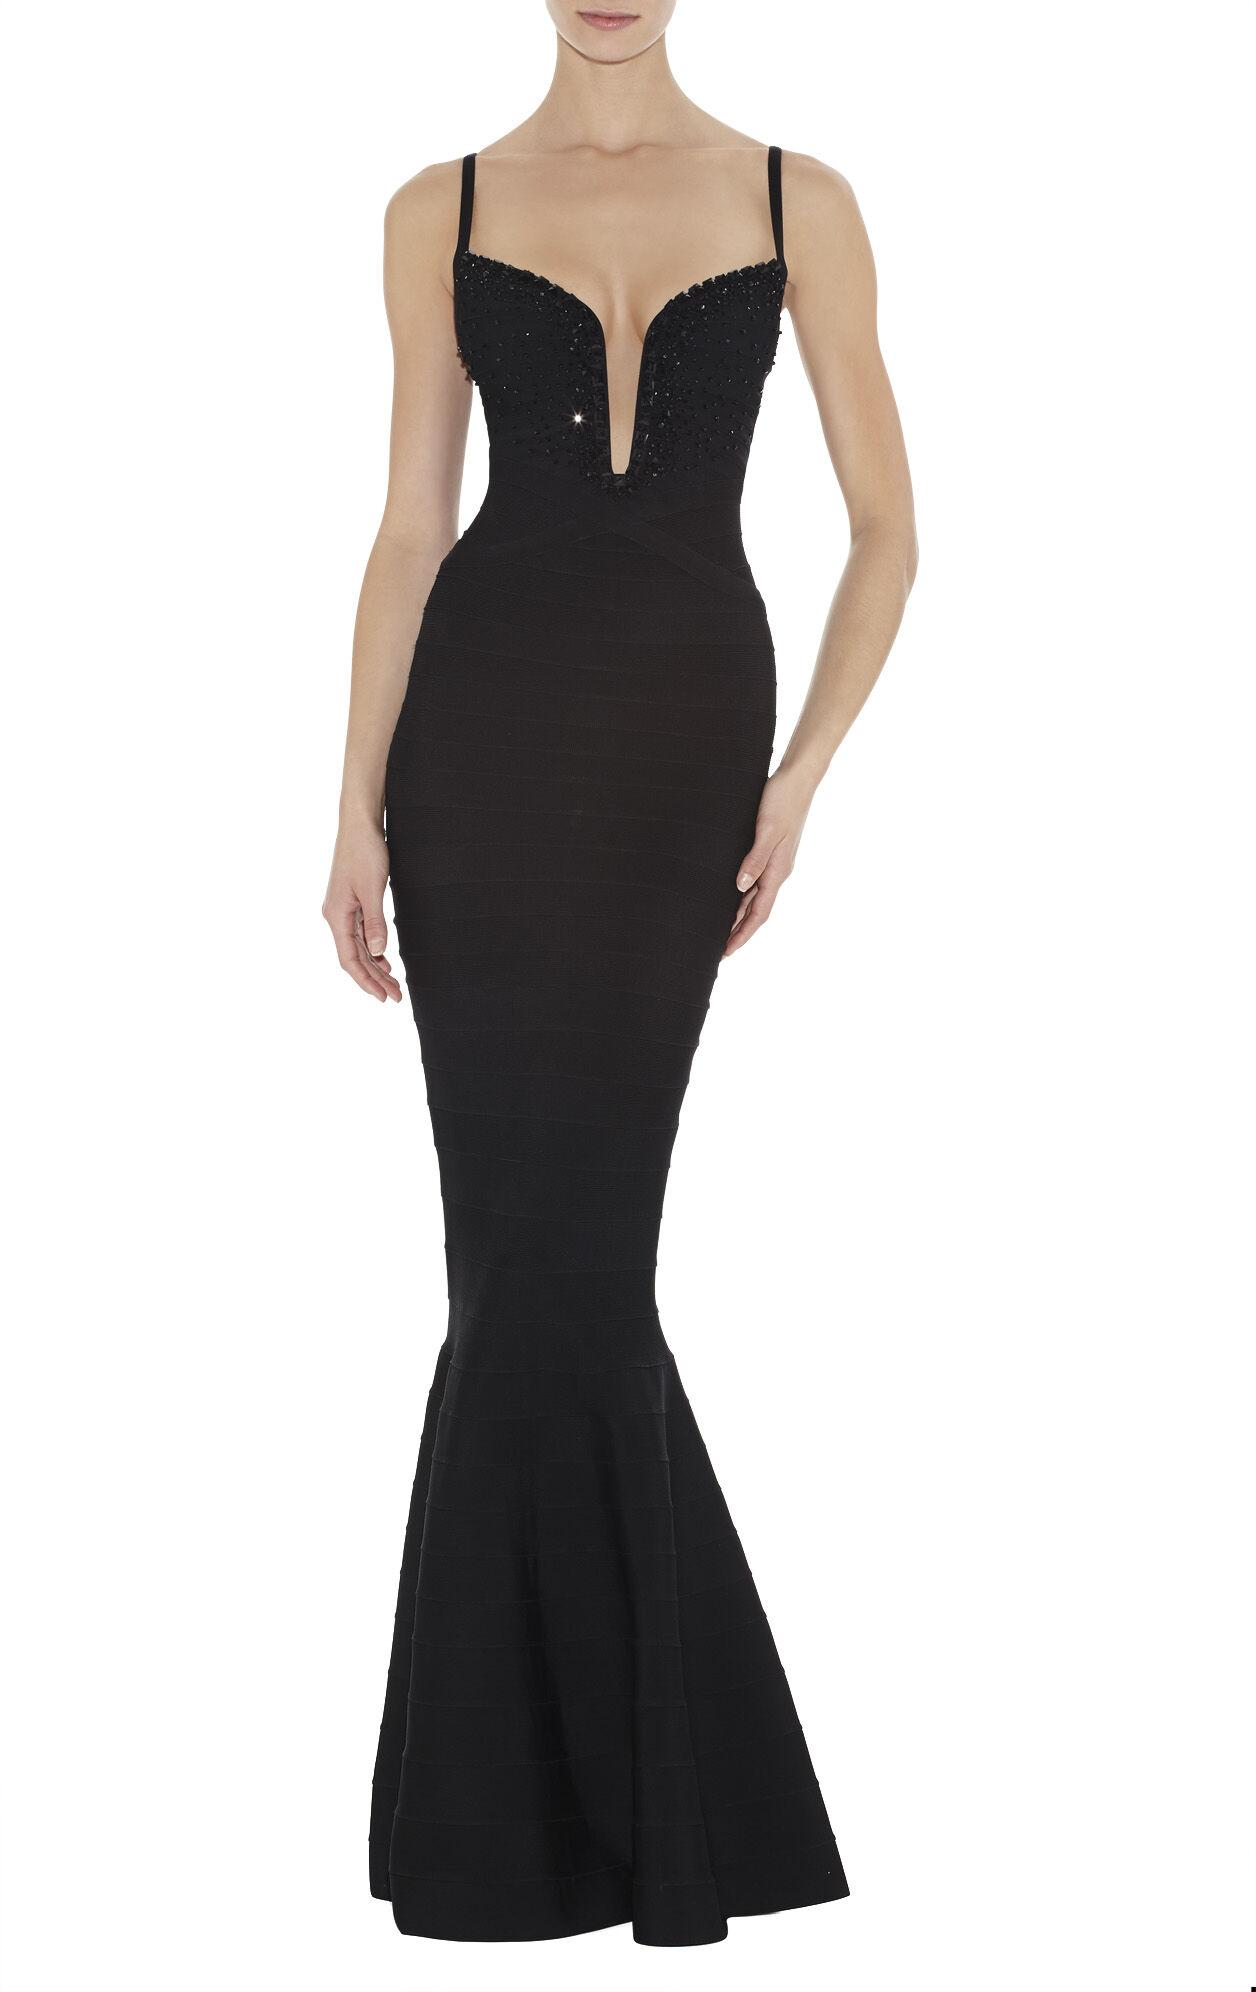 Priscilla Beaded Wire-Neckline Dress